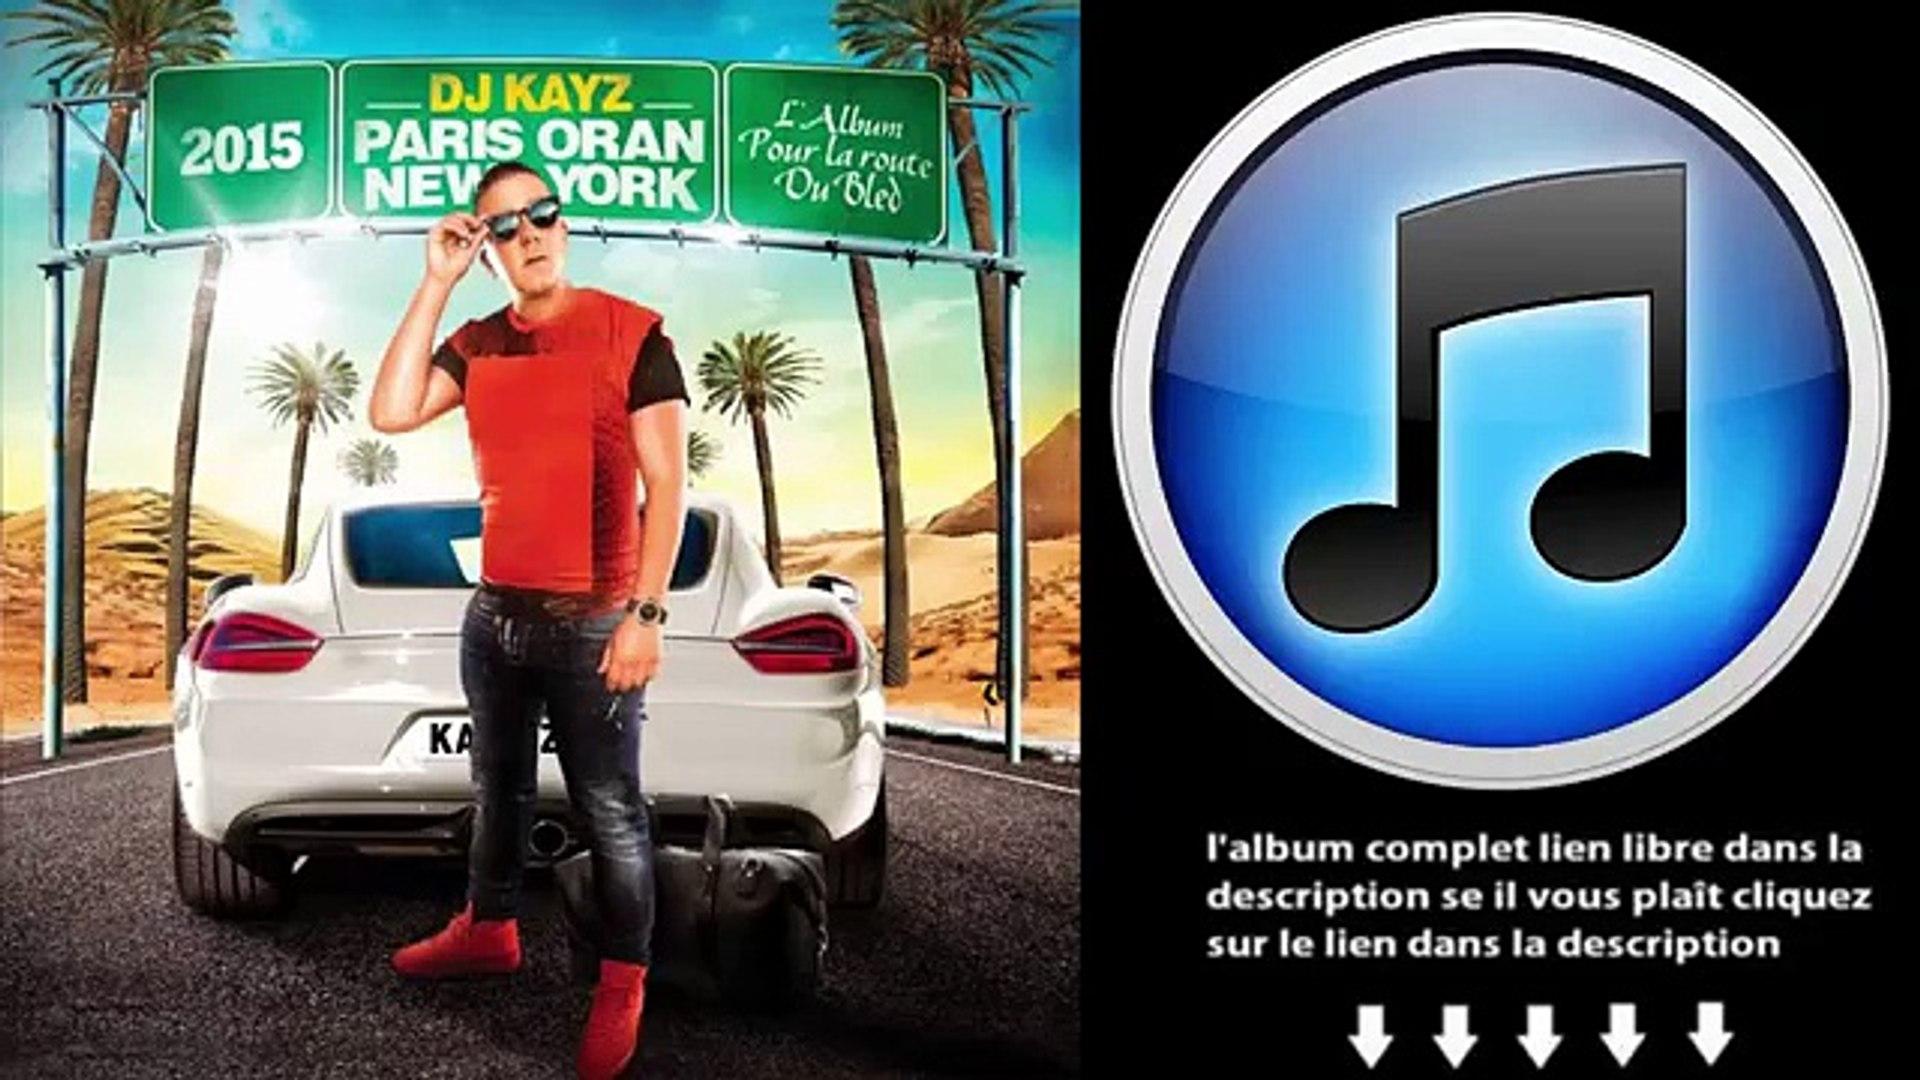 ORAN PARIS 5 KAYZ NEW DJ TÉLÉCHARGER GRATUITEMENT YORK